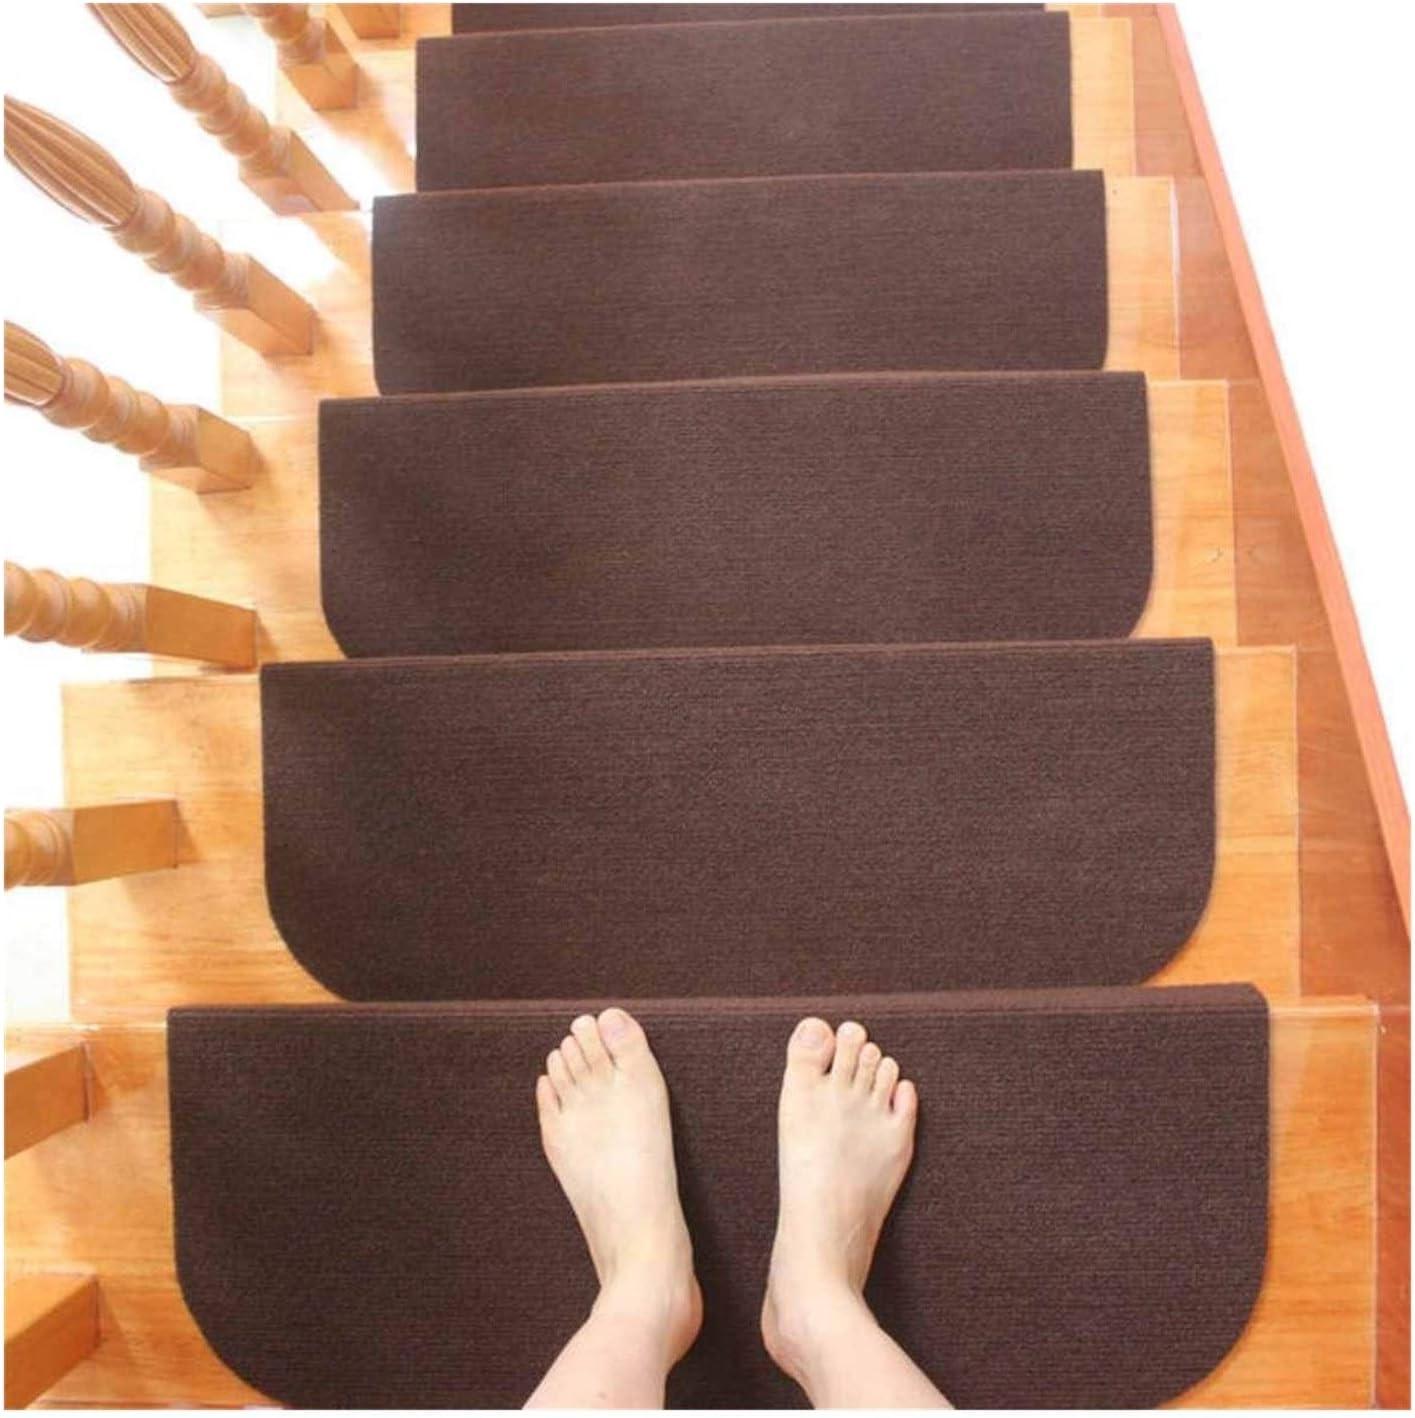 JDJD Morden Stair Limited time sale Popular overseas Carpet Household Door Area R Step Non-Slip Mat